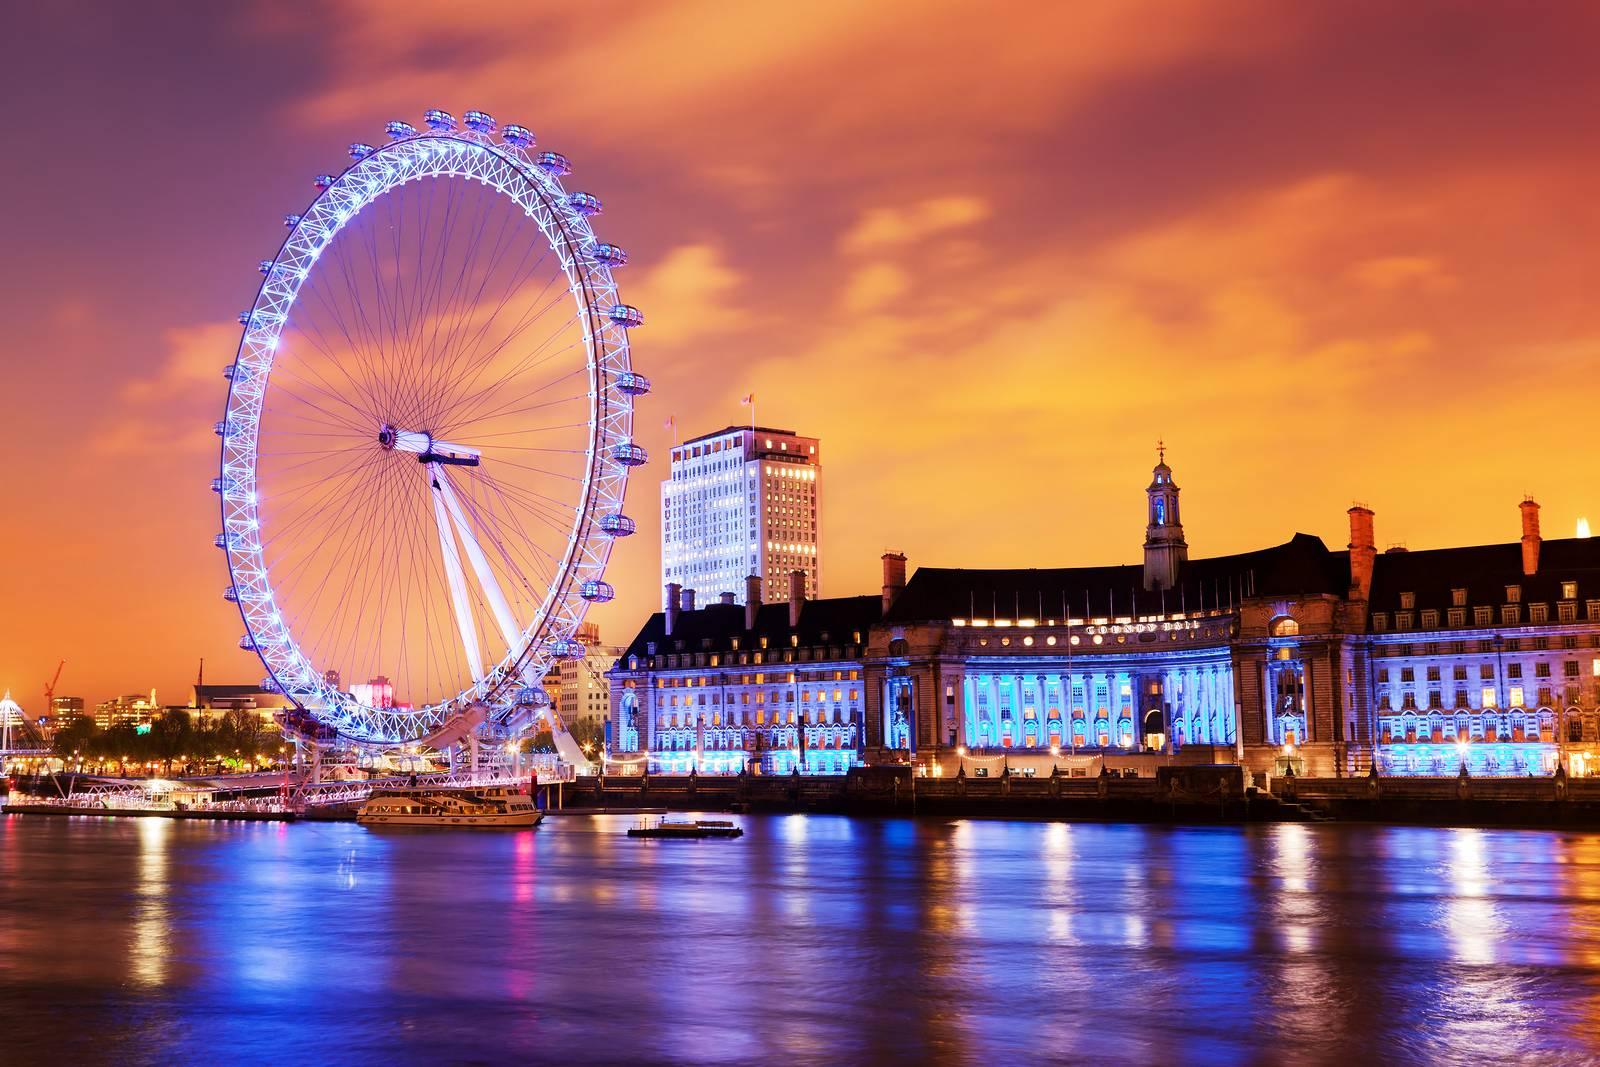 Bild des London Eyes